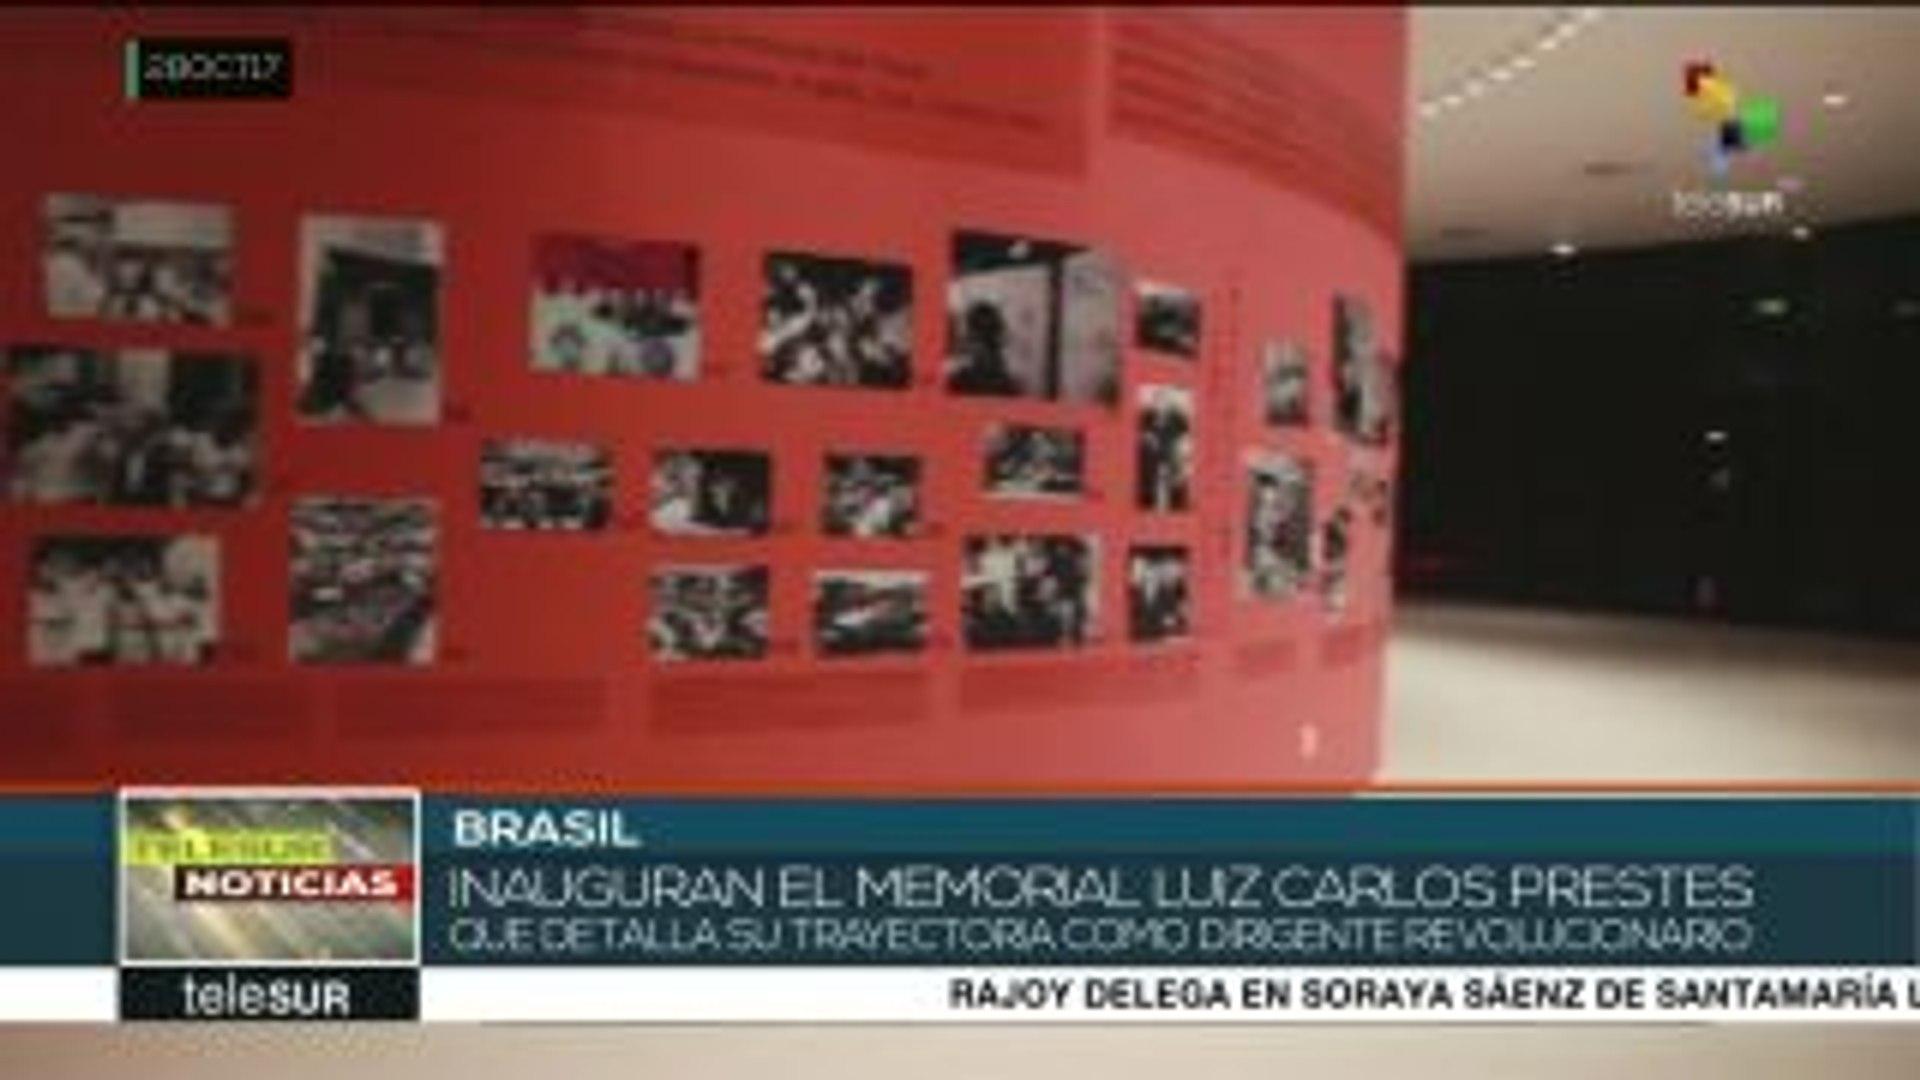 Brasil: Porto Alegre inaugura Memorial Luiz Carlos Prestes